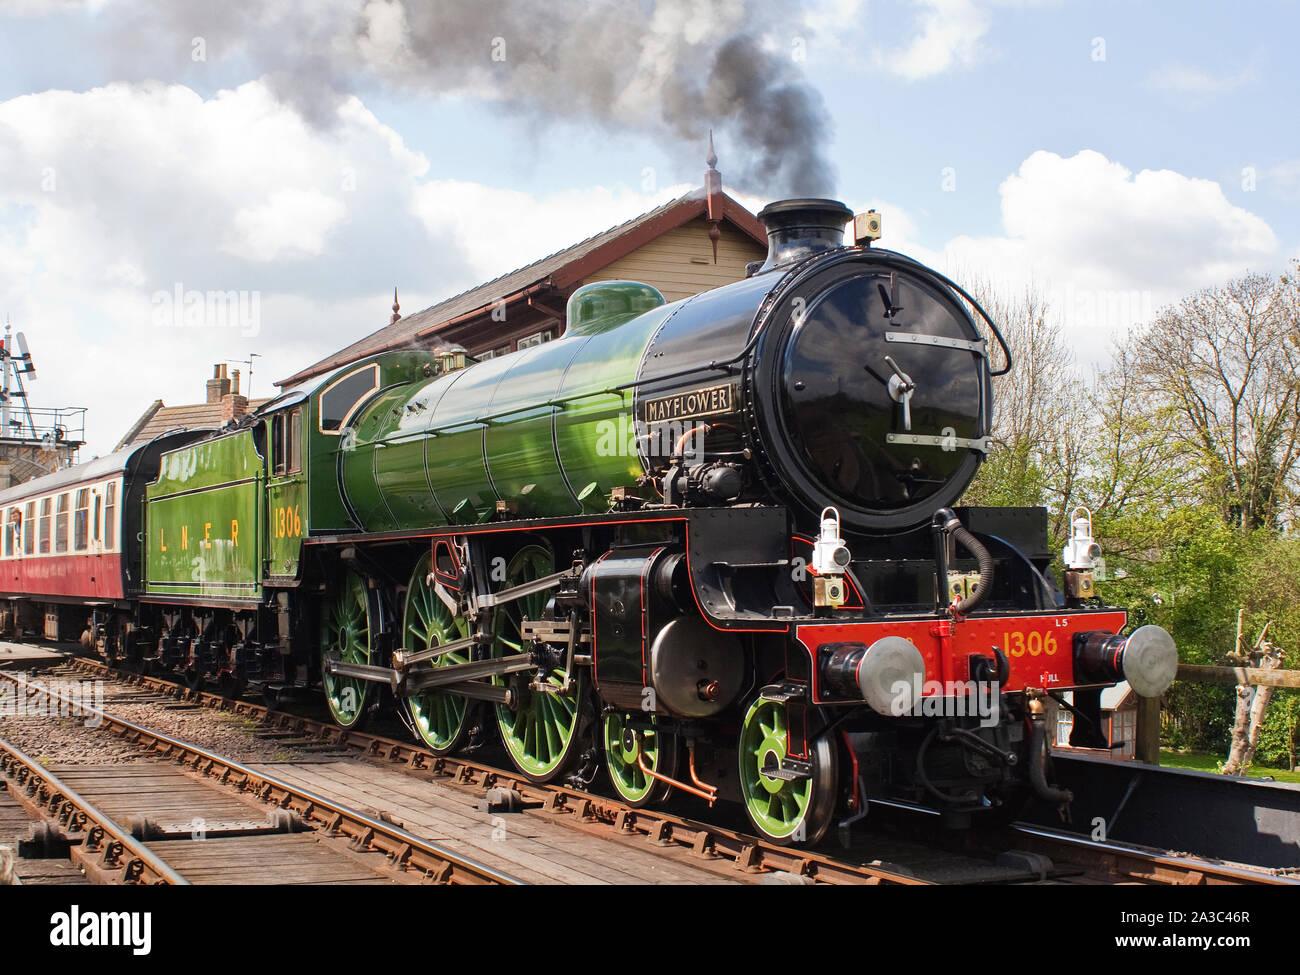 Steam locomotive engine Mayflower Stock Photo